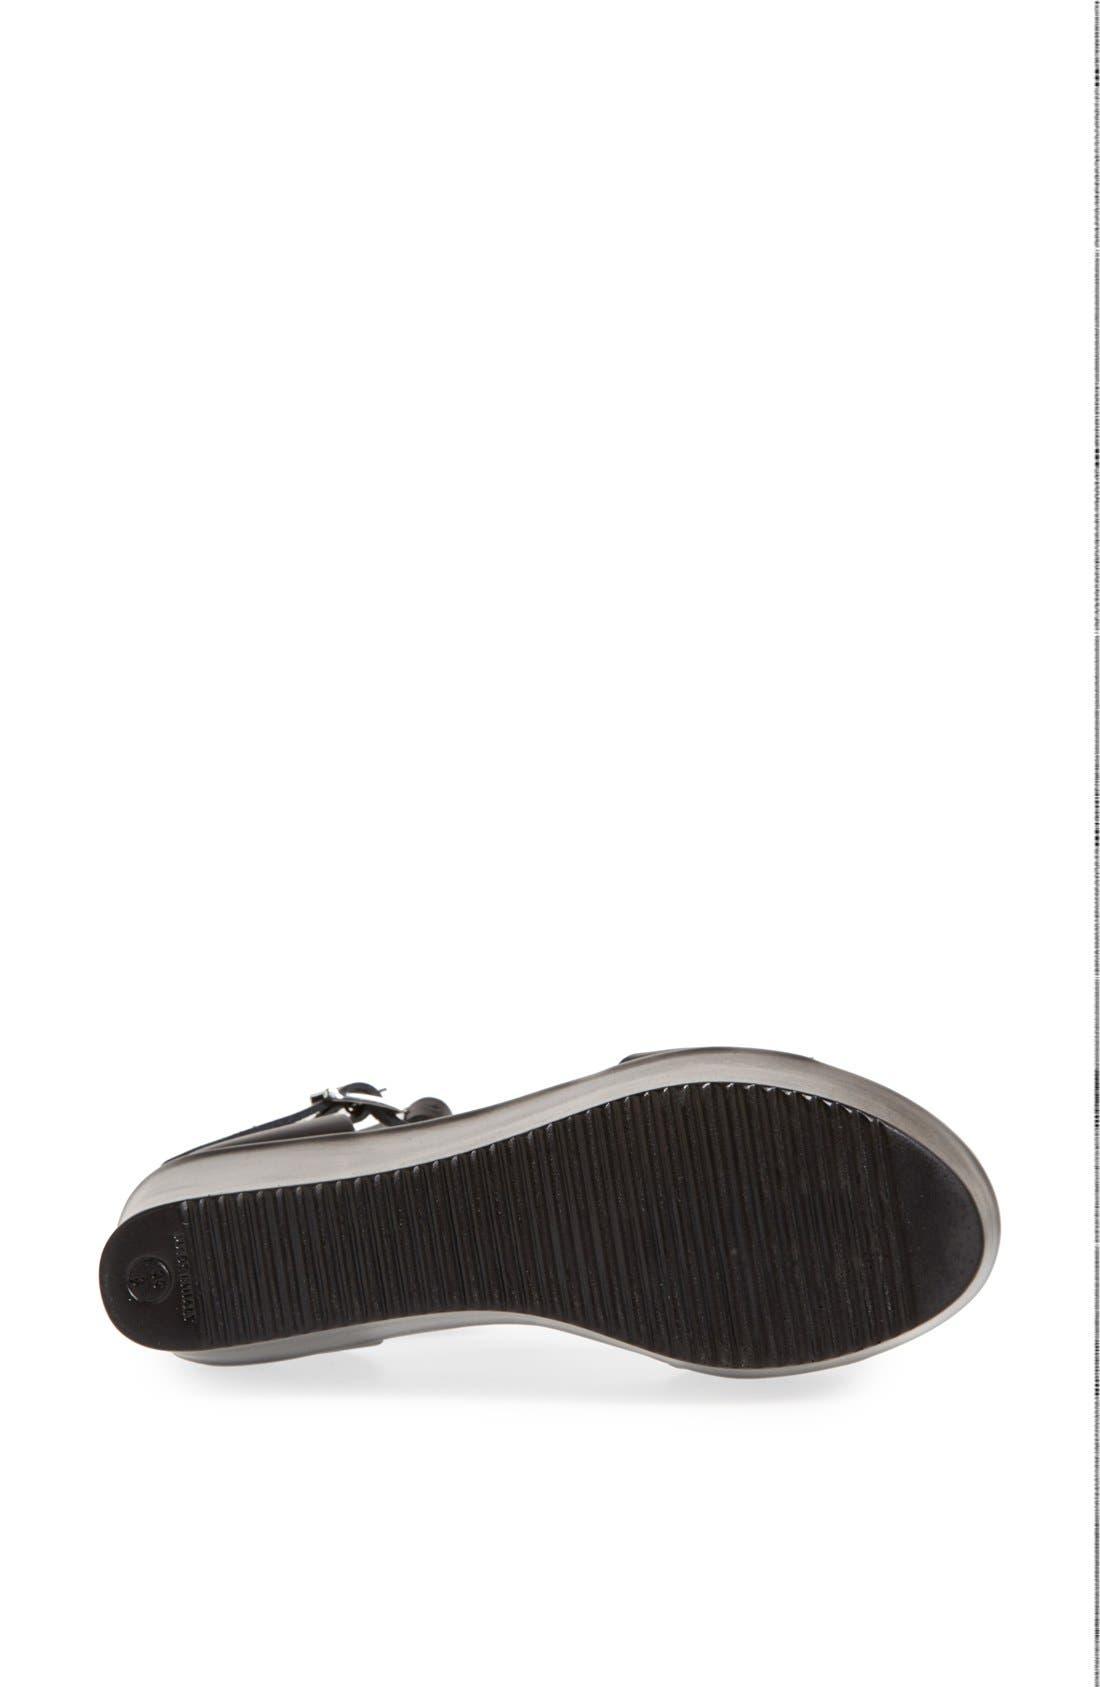 TOPSHOP, 'Wallis' Ankle Strap Platform Sandal, Alternate thumbnail 3, color, 001